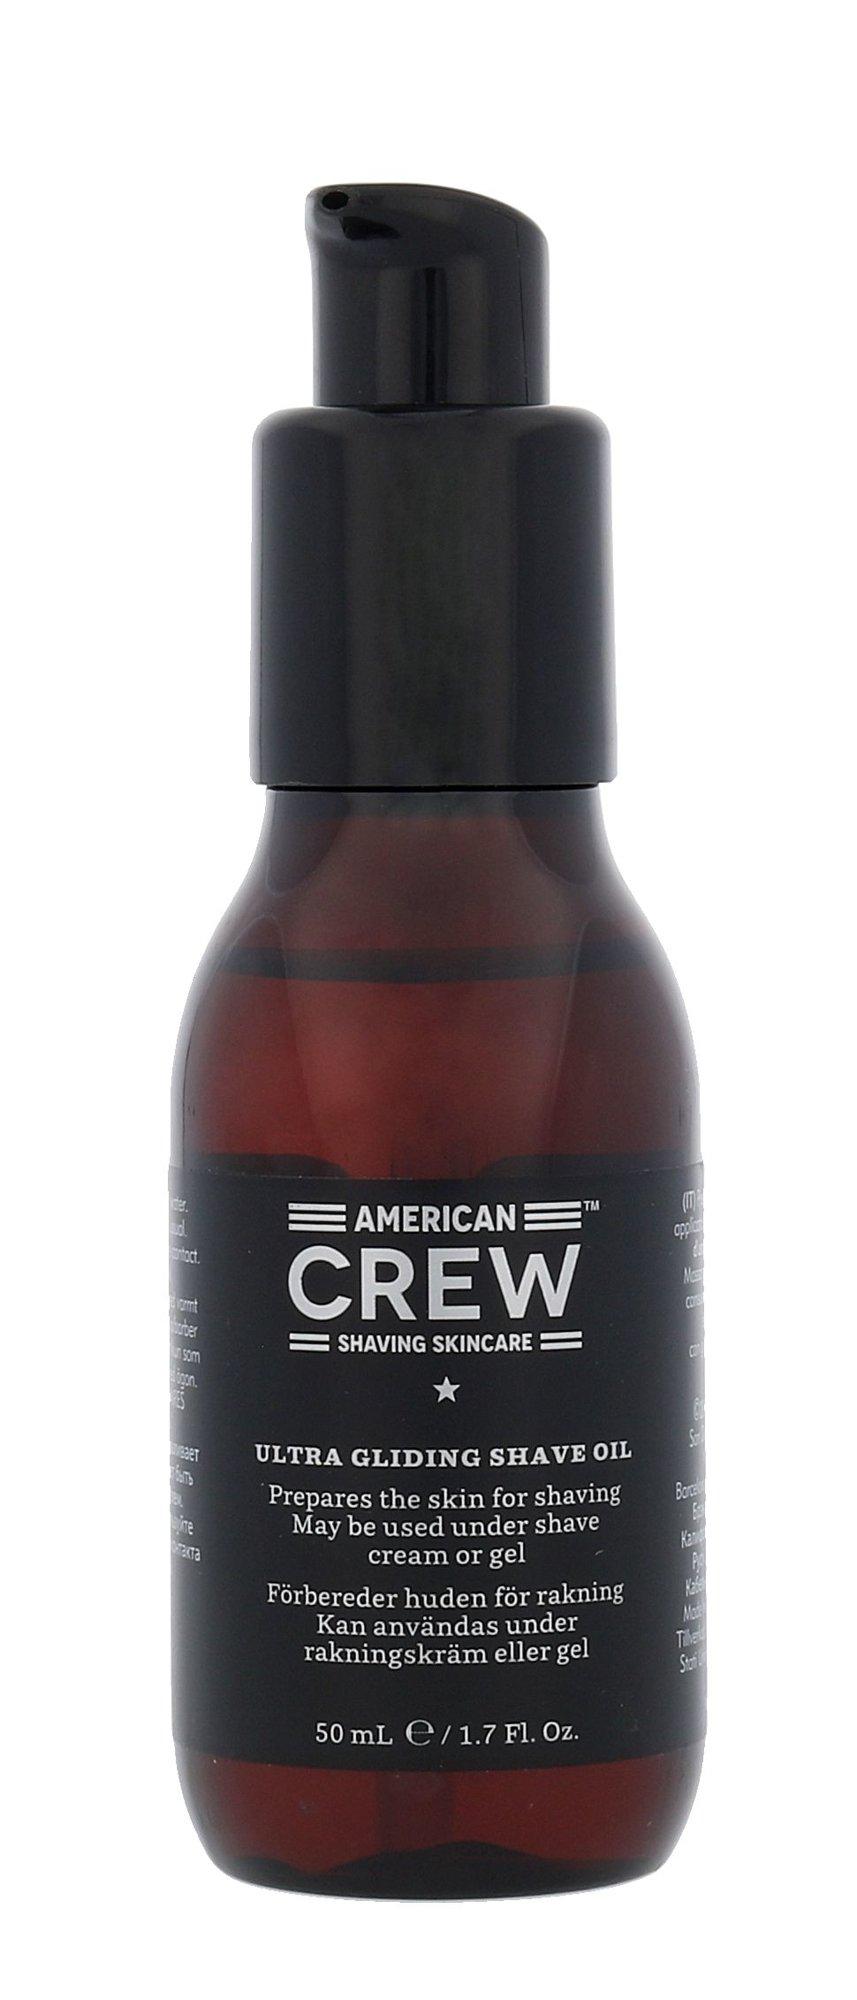 American Crew Shaving Skincare Cosmetic 50ml  Ultra Gliding Shave Oil